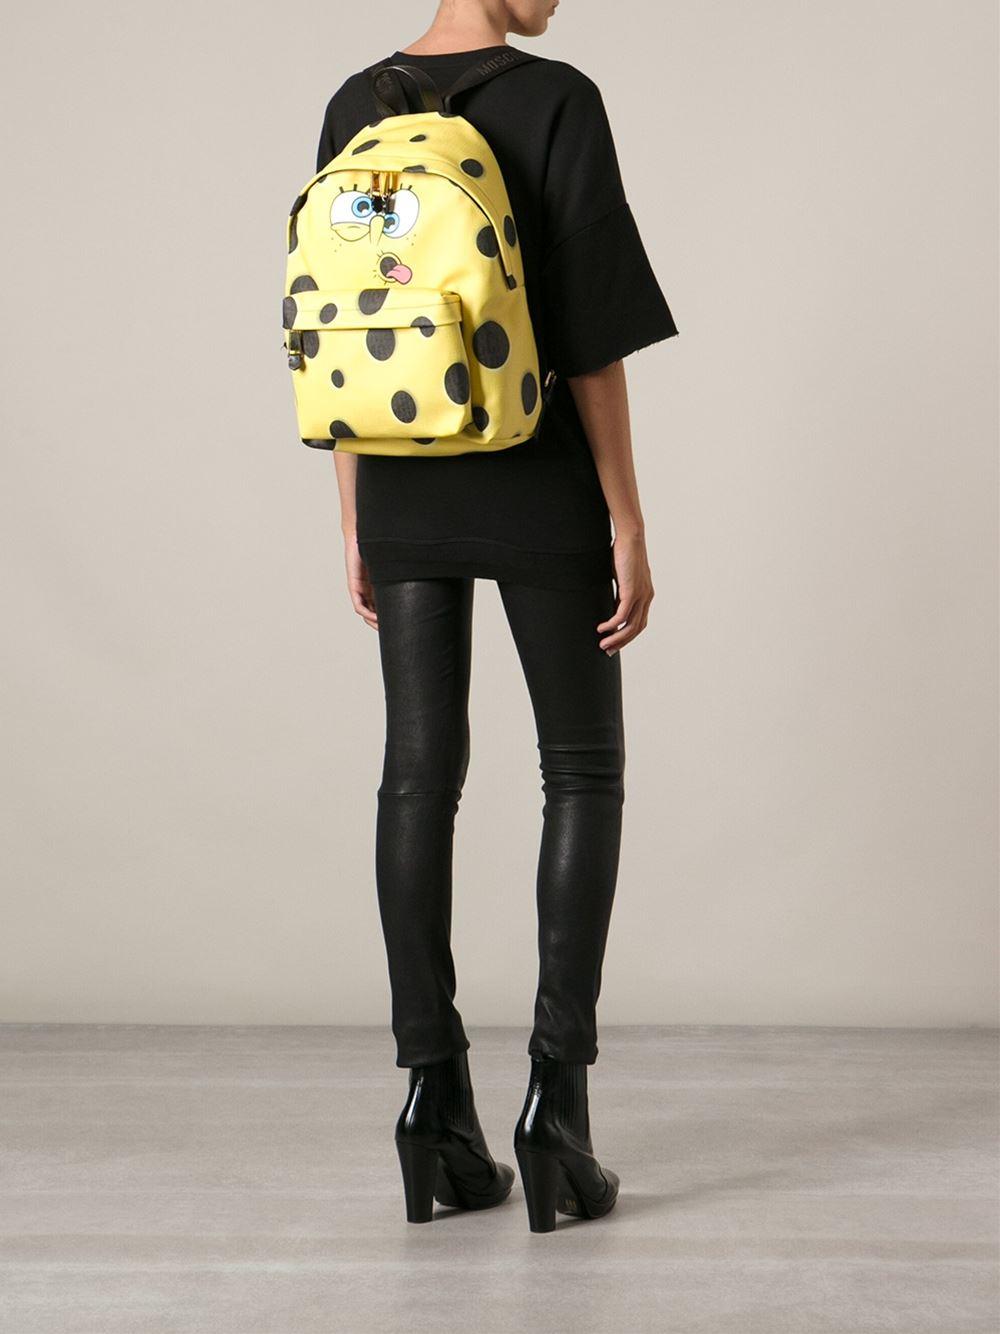 Lyst Moschino Spongebob Squarepants Backpack In Yellow